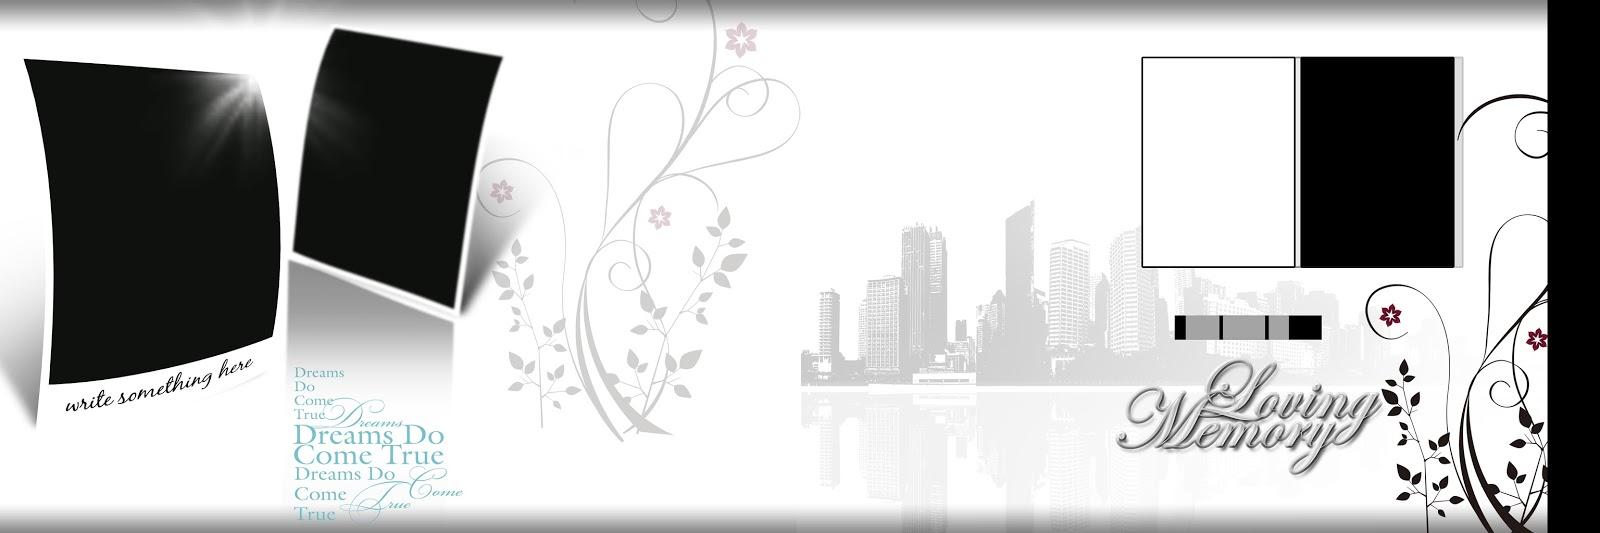 Karizma Album Design 12x36 With Flower Photo Frame - Luckystudio4u